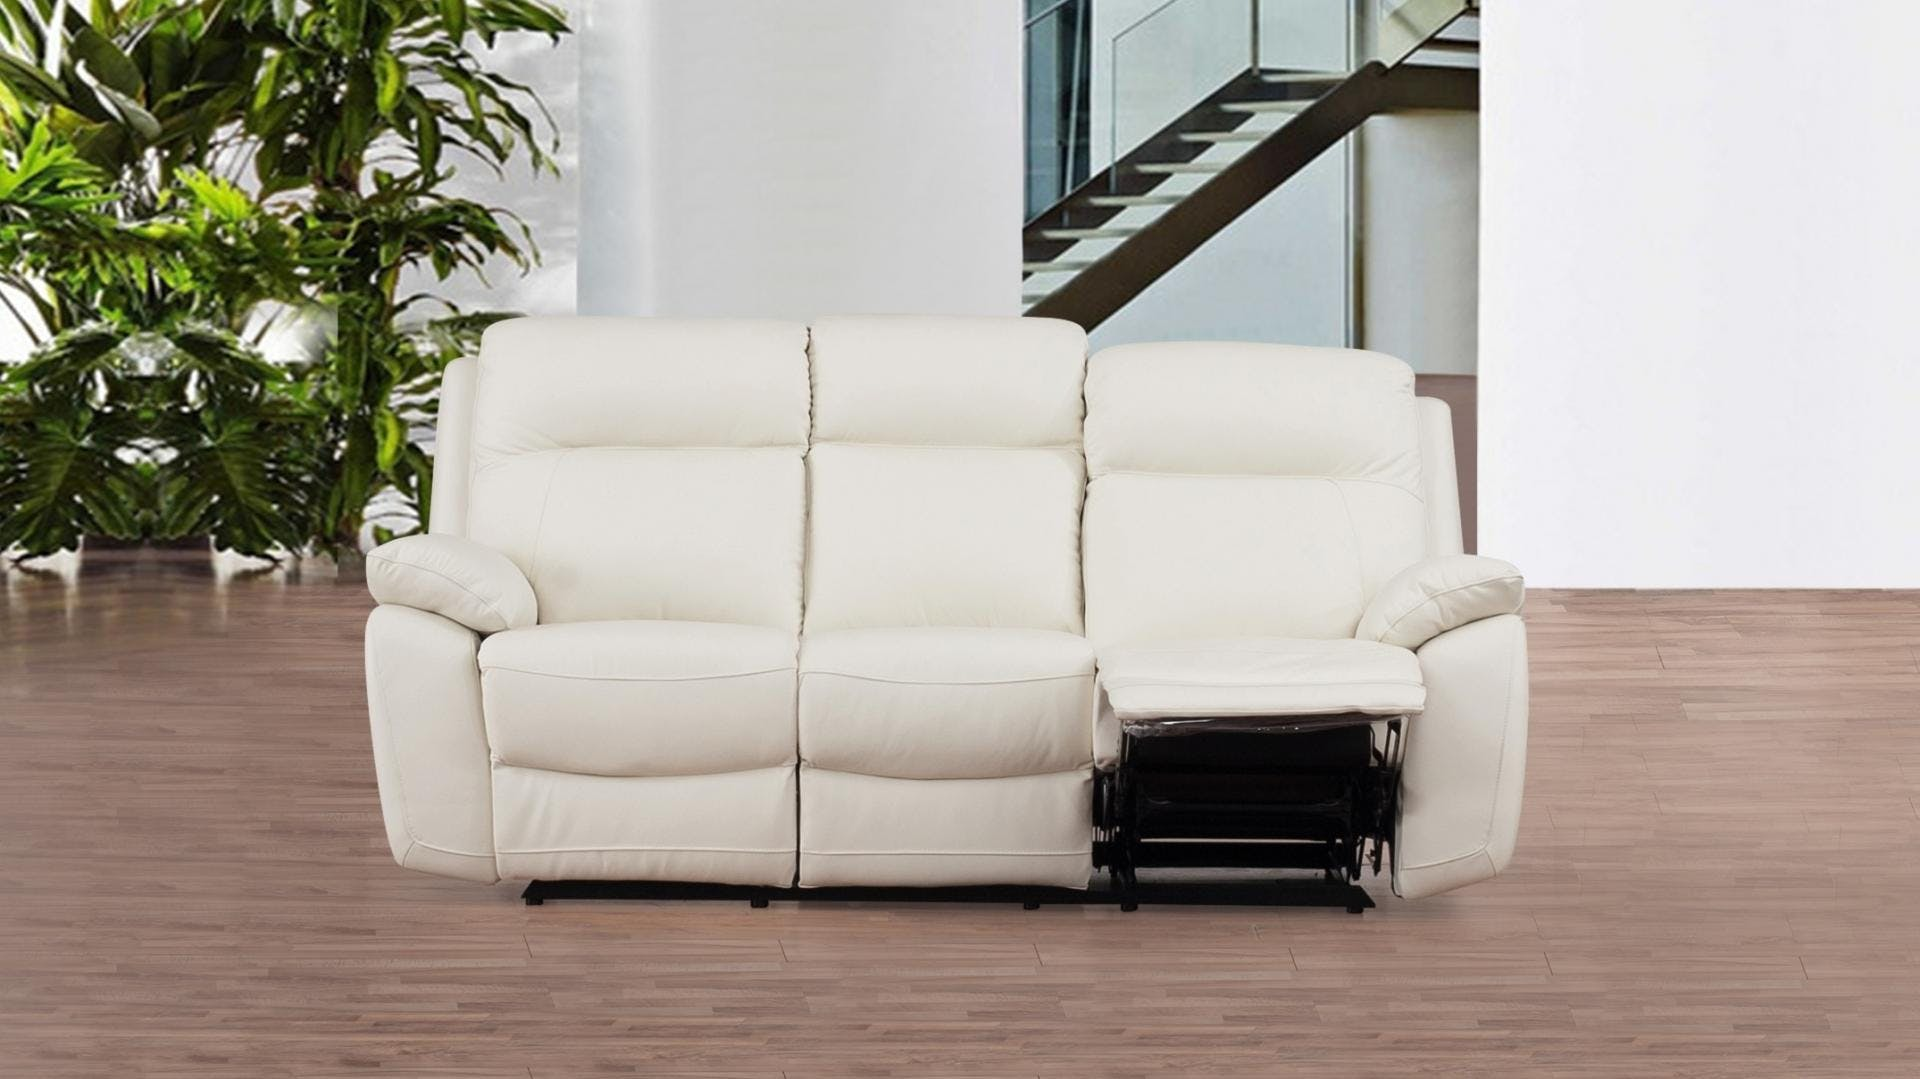 Fine Berkeley Leather Recliner Sofa Suite 3 2 1 Lounge Life Dailytribune Chair Design For Home Dailytribuneorg